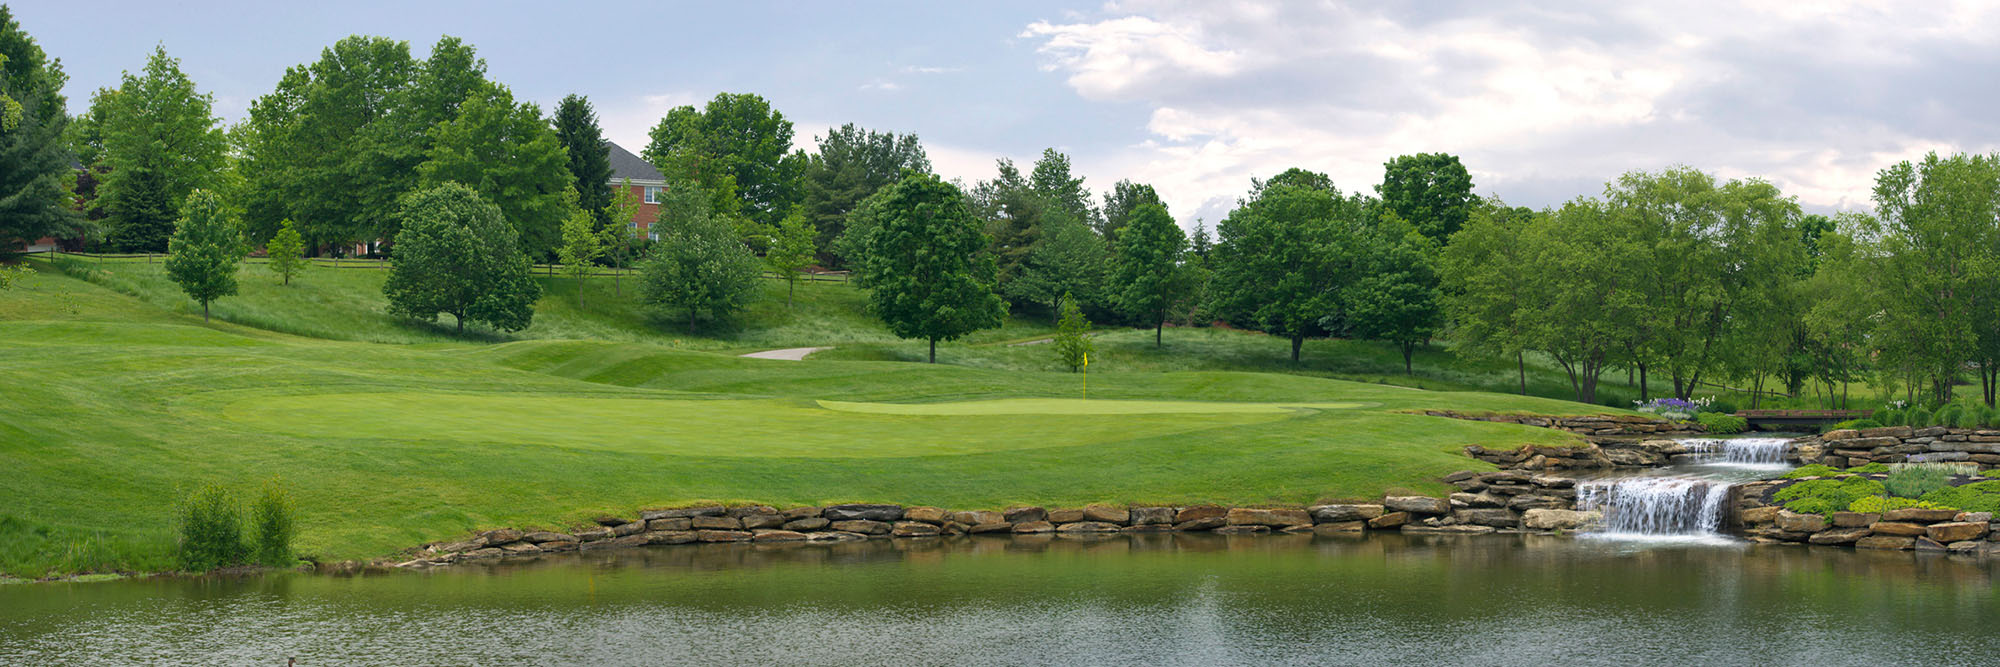 Golf Course Image - Nevillewood No. 9